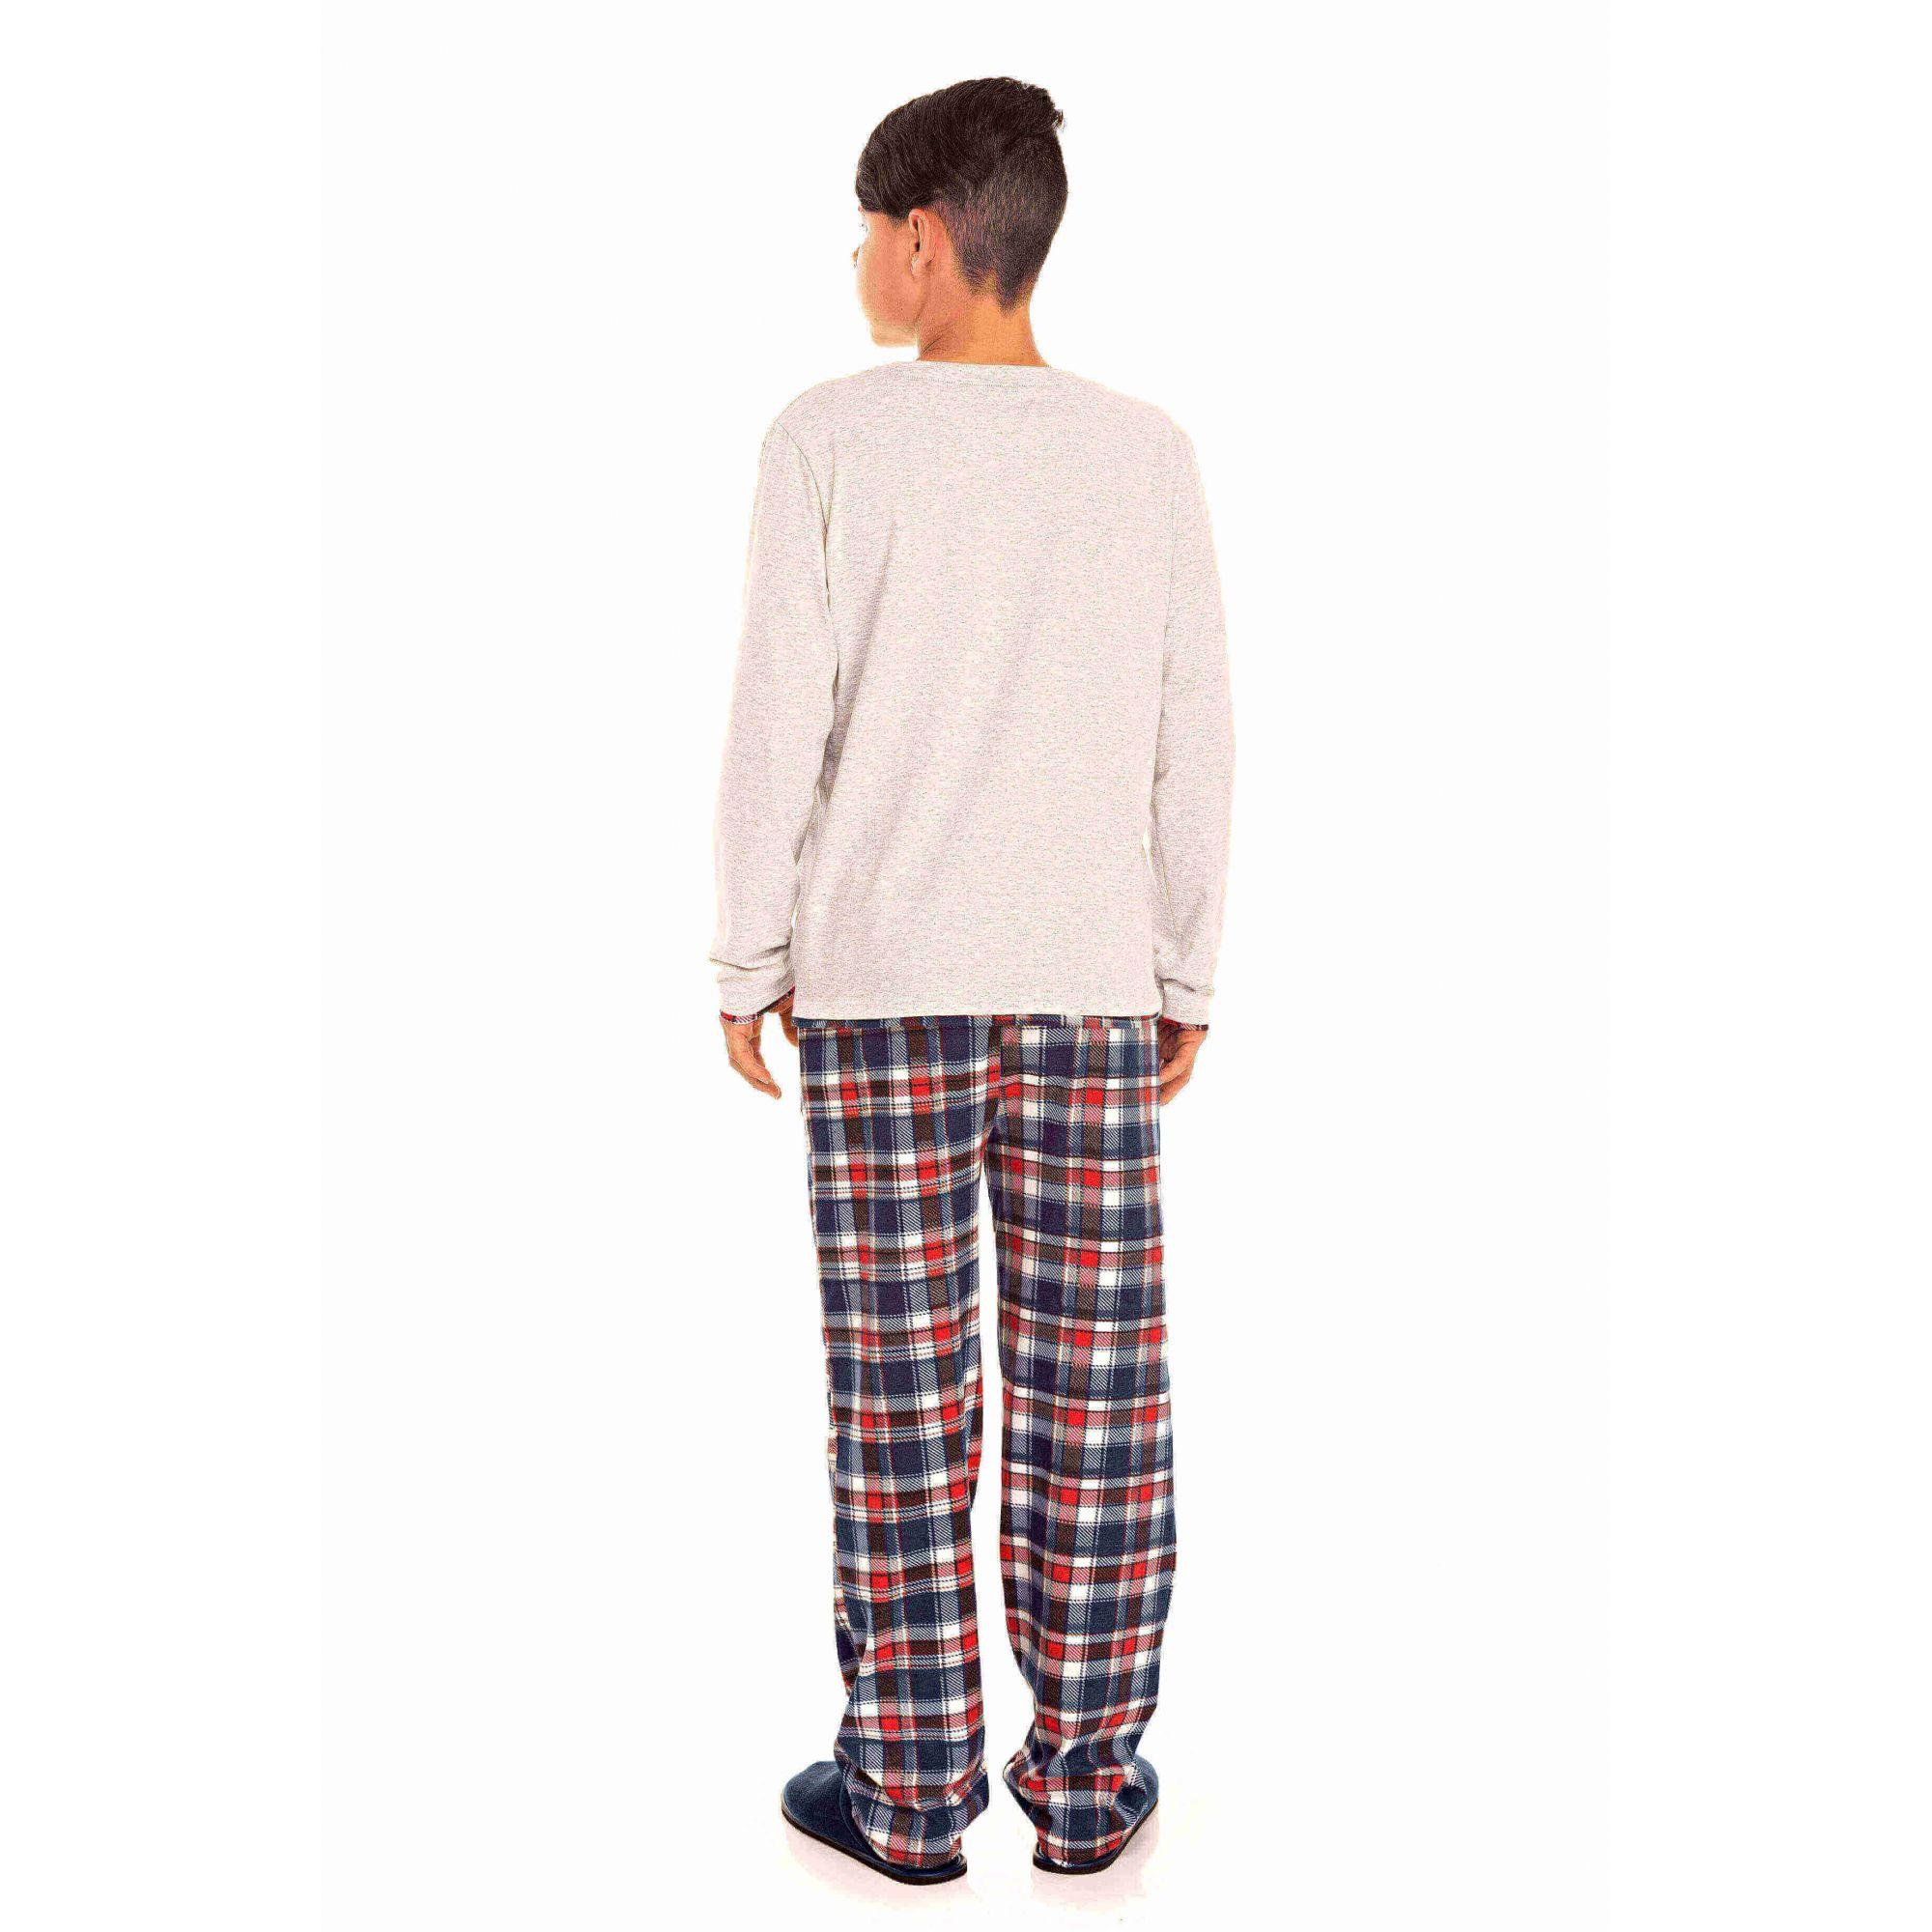 092/E - Pijama  Juvenil Masculino Xadrez